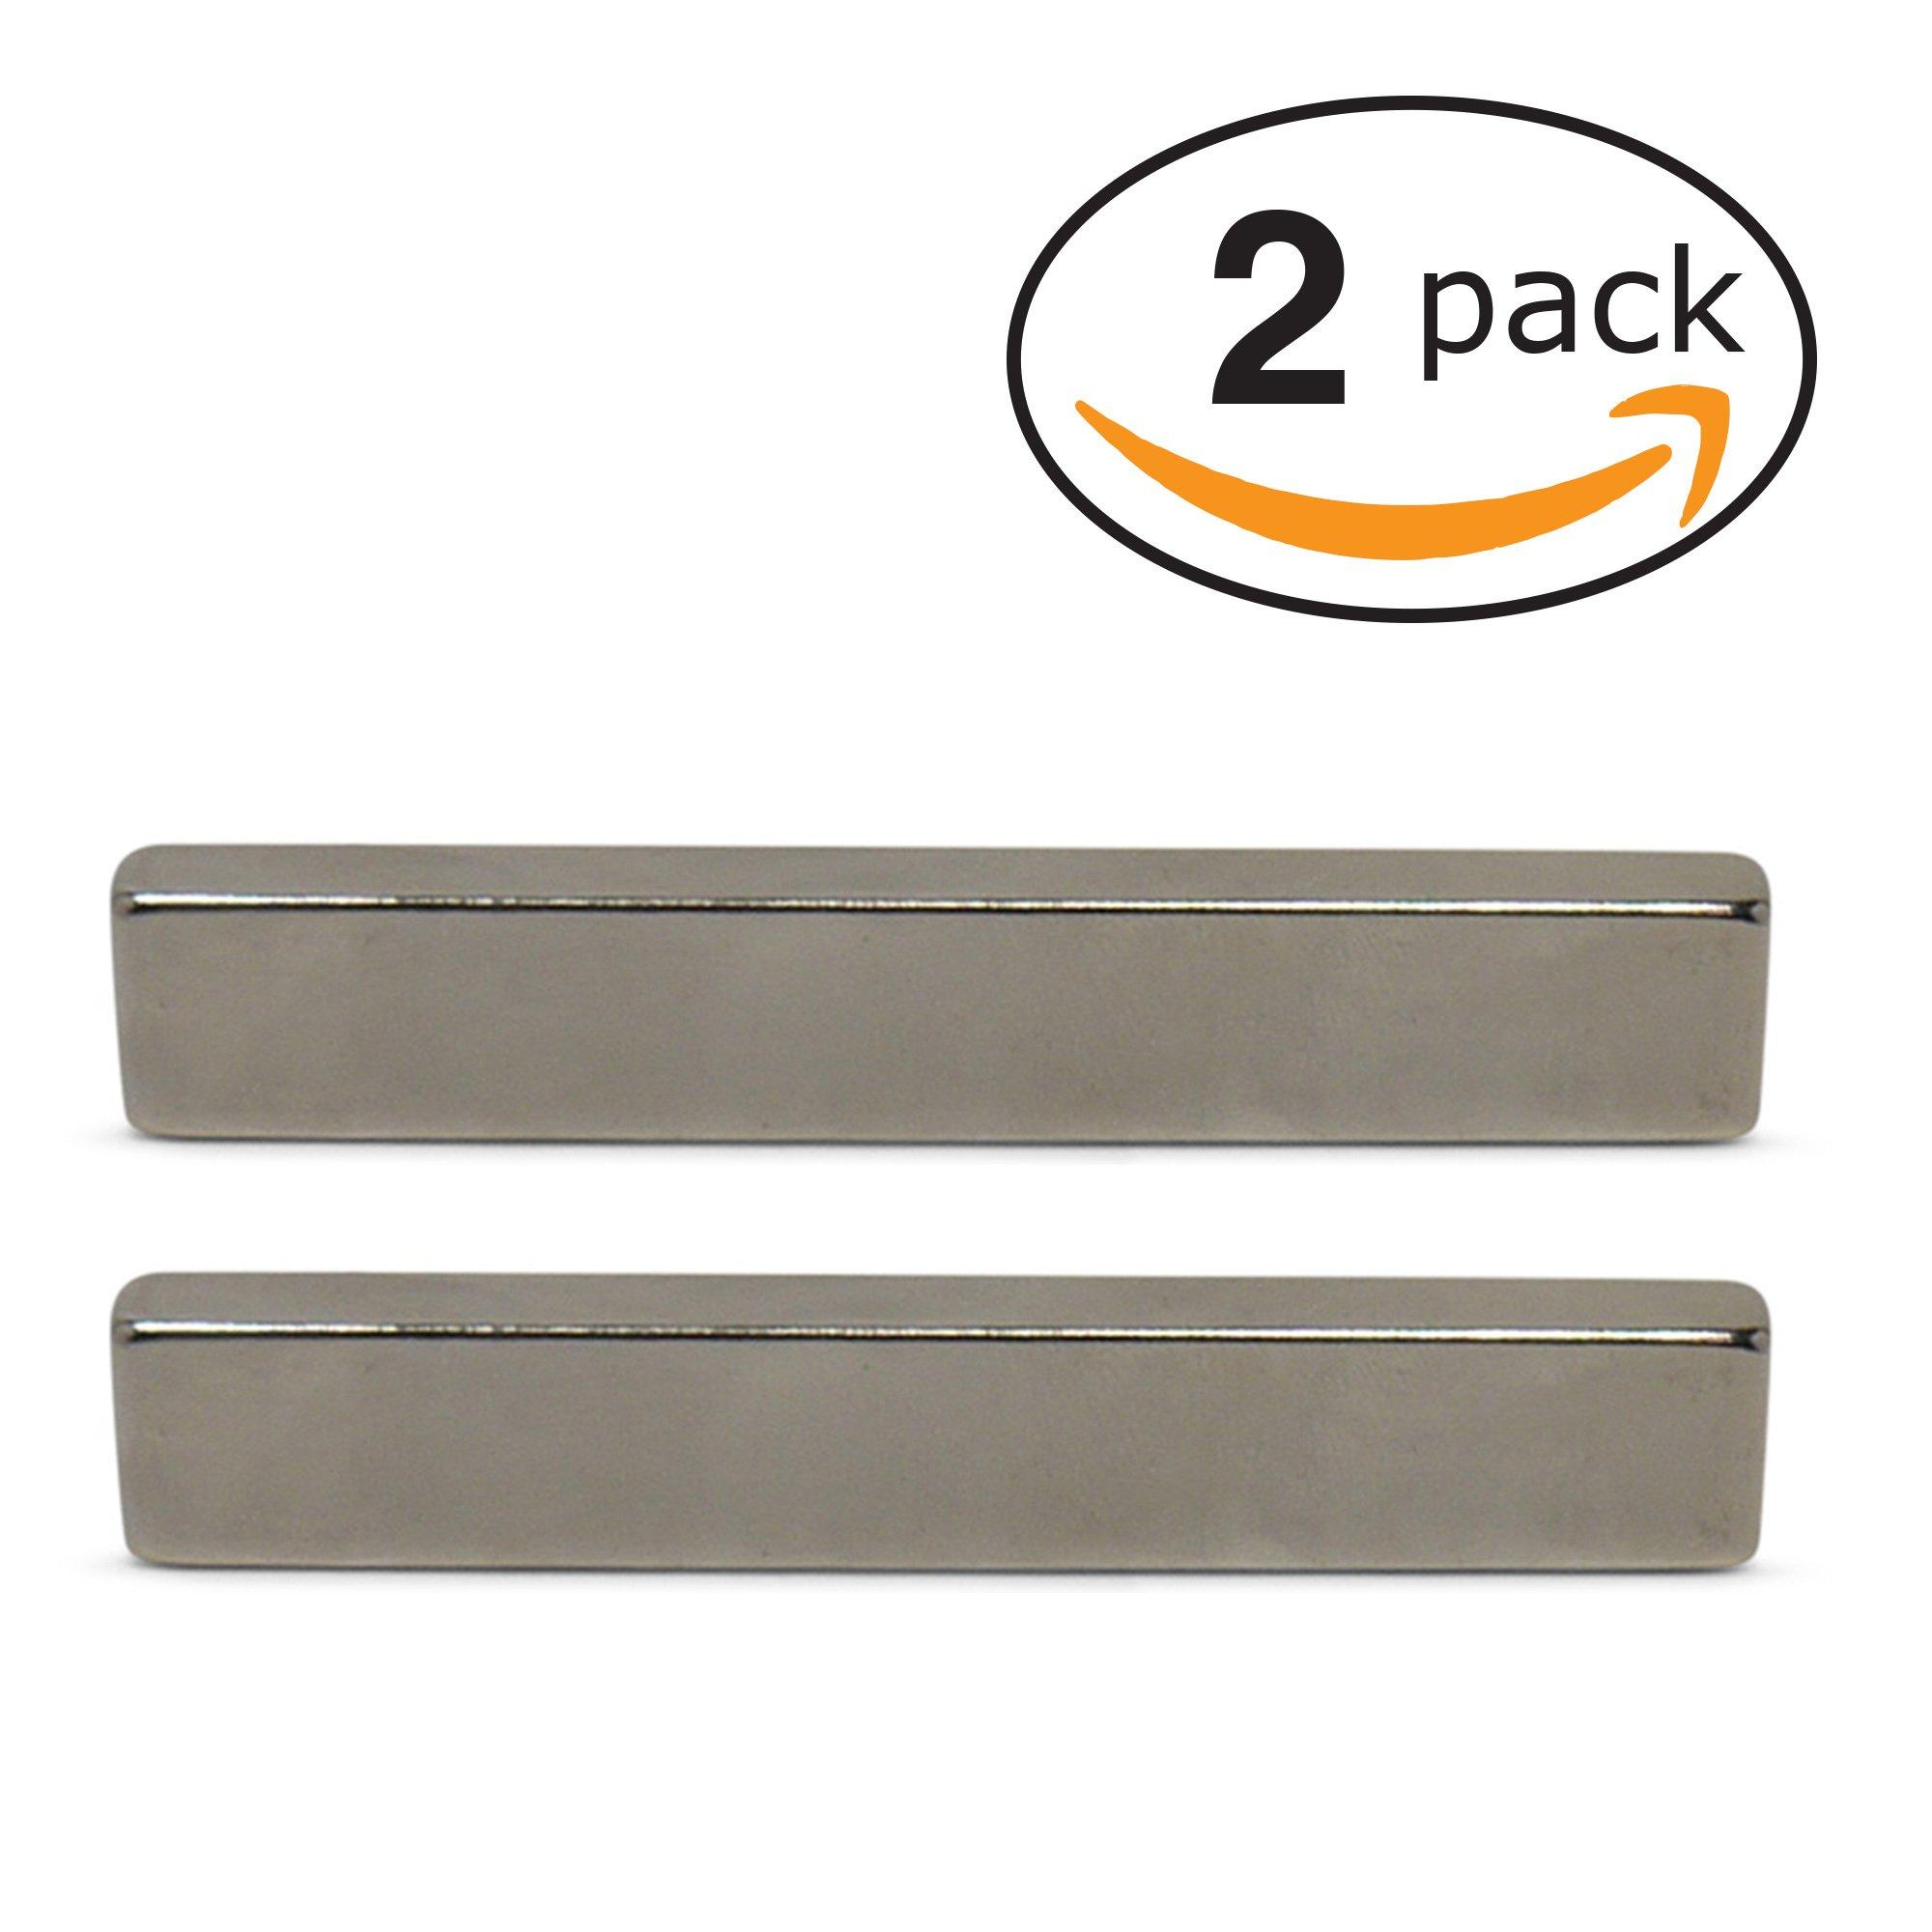 "Neodymium Bar Magnets (INDUSTRIAL STRENGTH - 2 PACK) Incredibly Strong 33+ LB Strength - N45 Grade Heavy Duty - Powerful Rare-Earth Metal Neodymium Magnet - 3"" x 1/2"" x 1/4"""